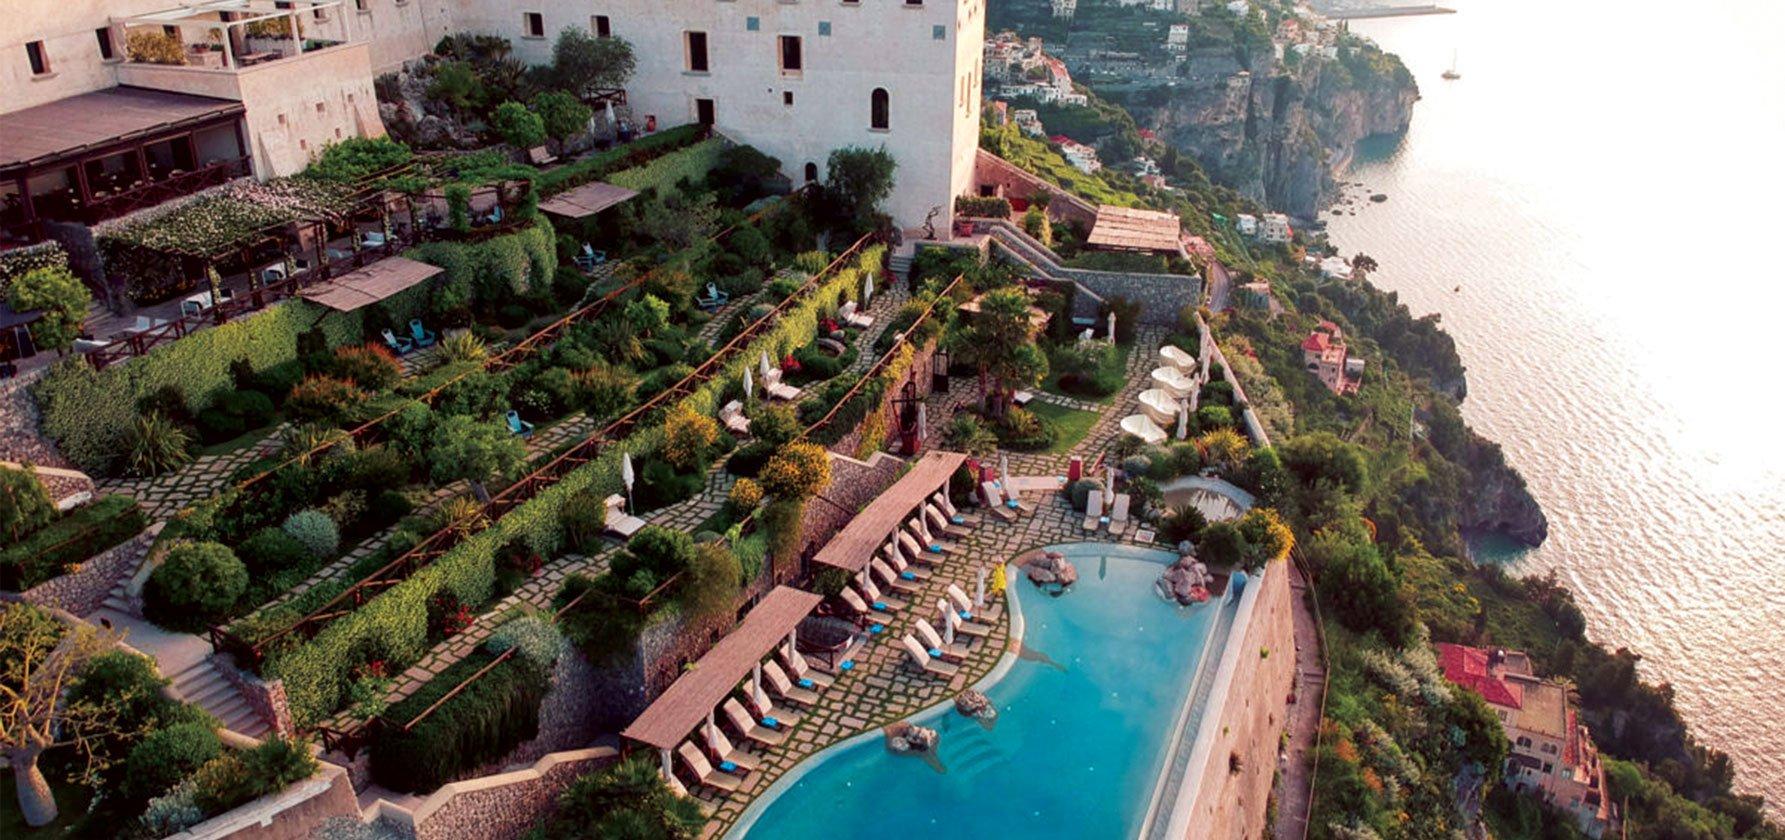 Monastero-Santa-Rosa-Hotel-&-Spa-_-Conca-dei-Marini,-Italy-1